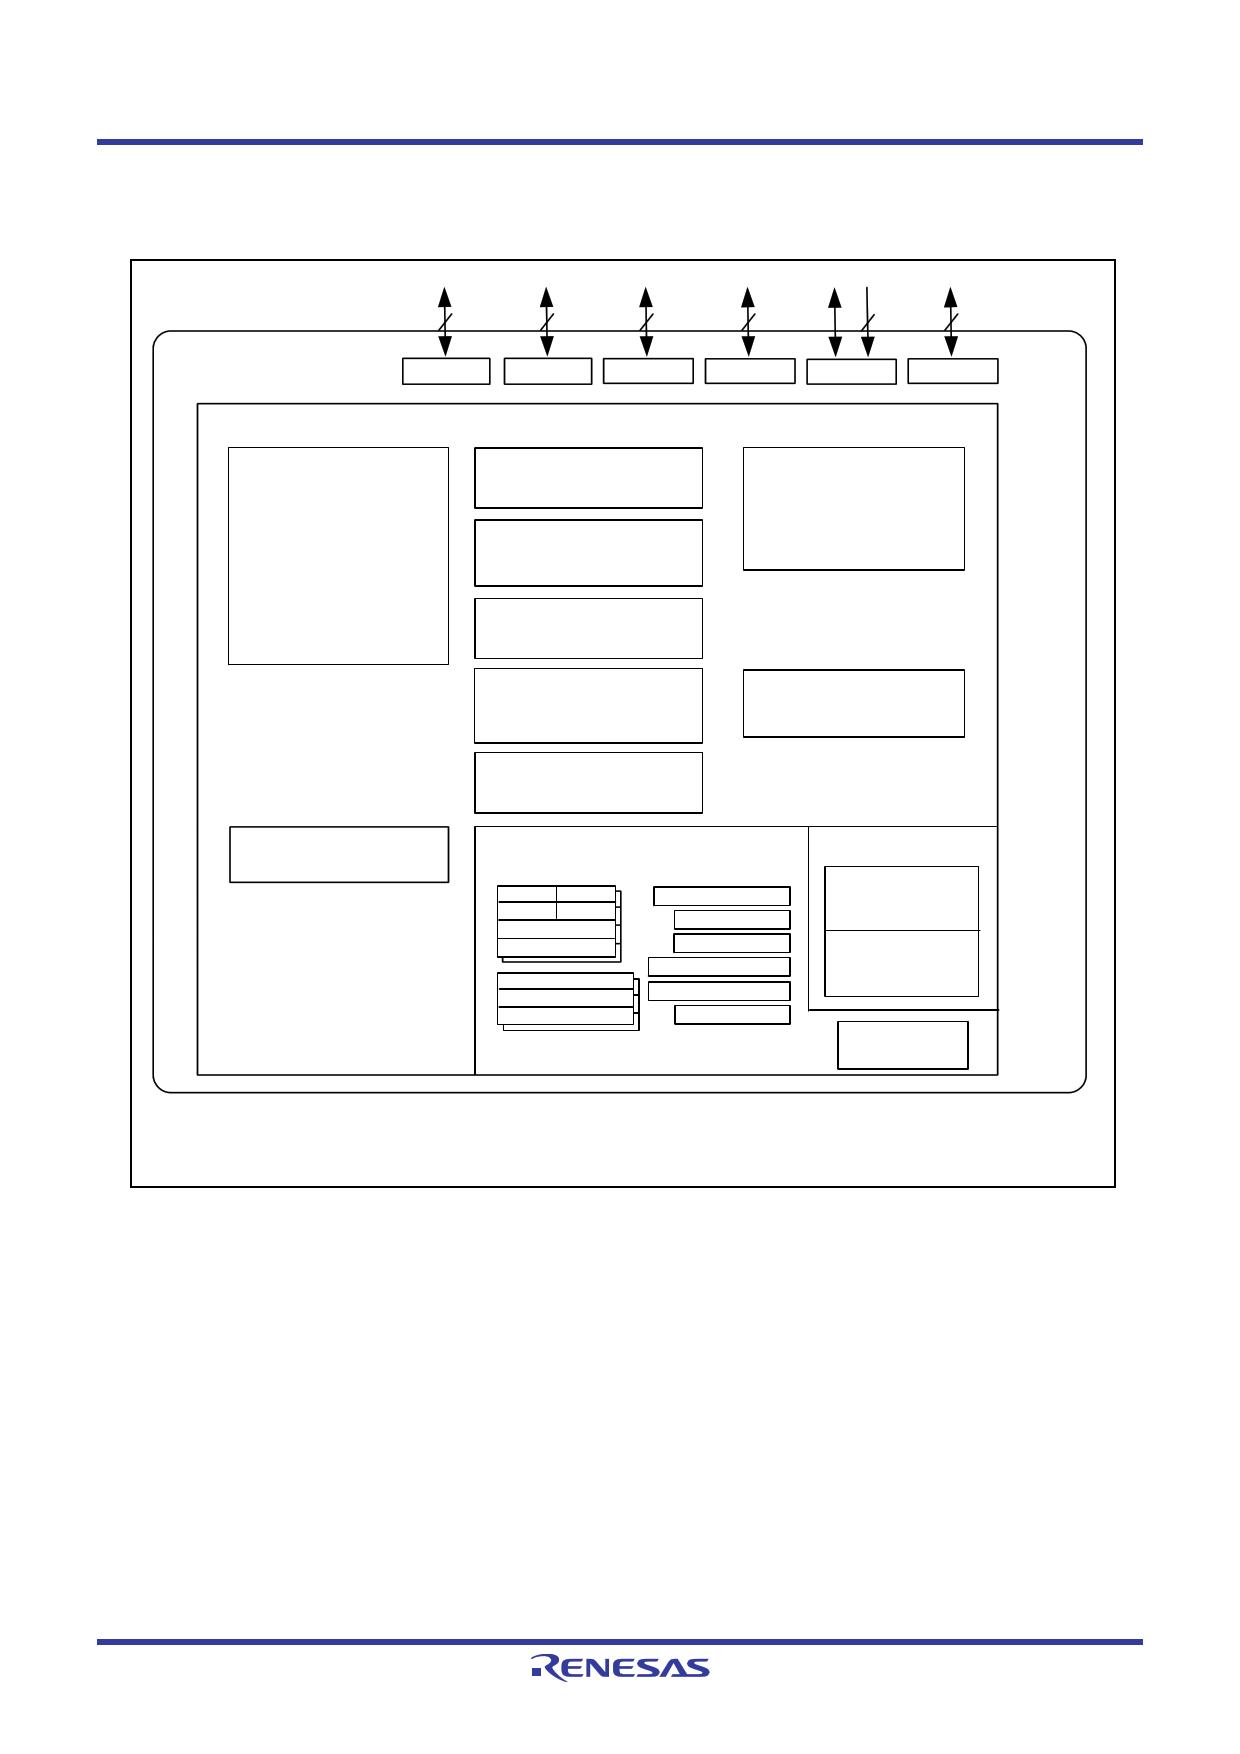 R5F21226DFP pdf, 반도체, 판매, 대치품